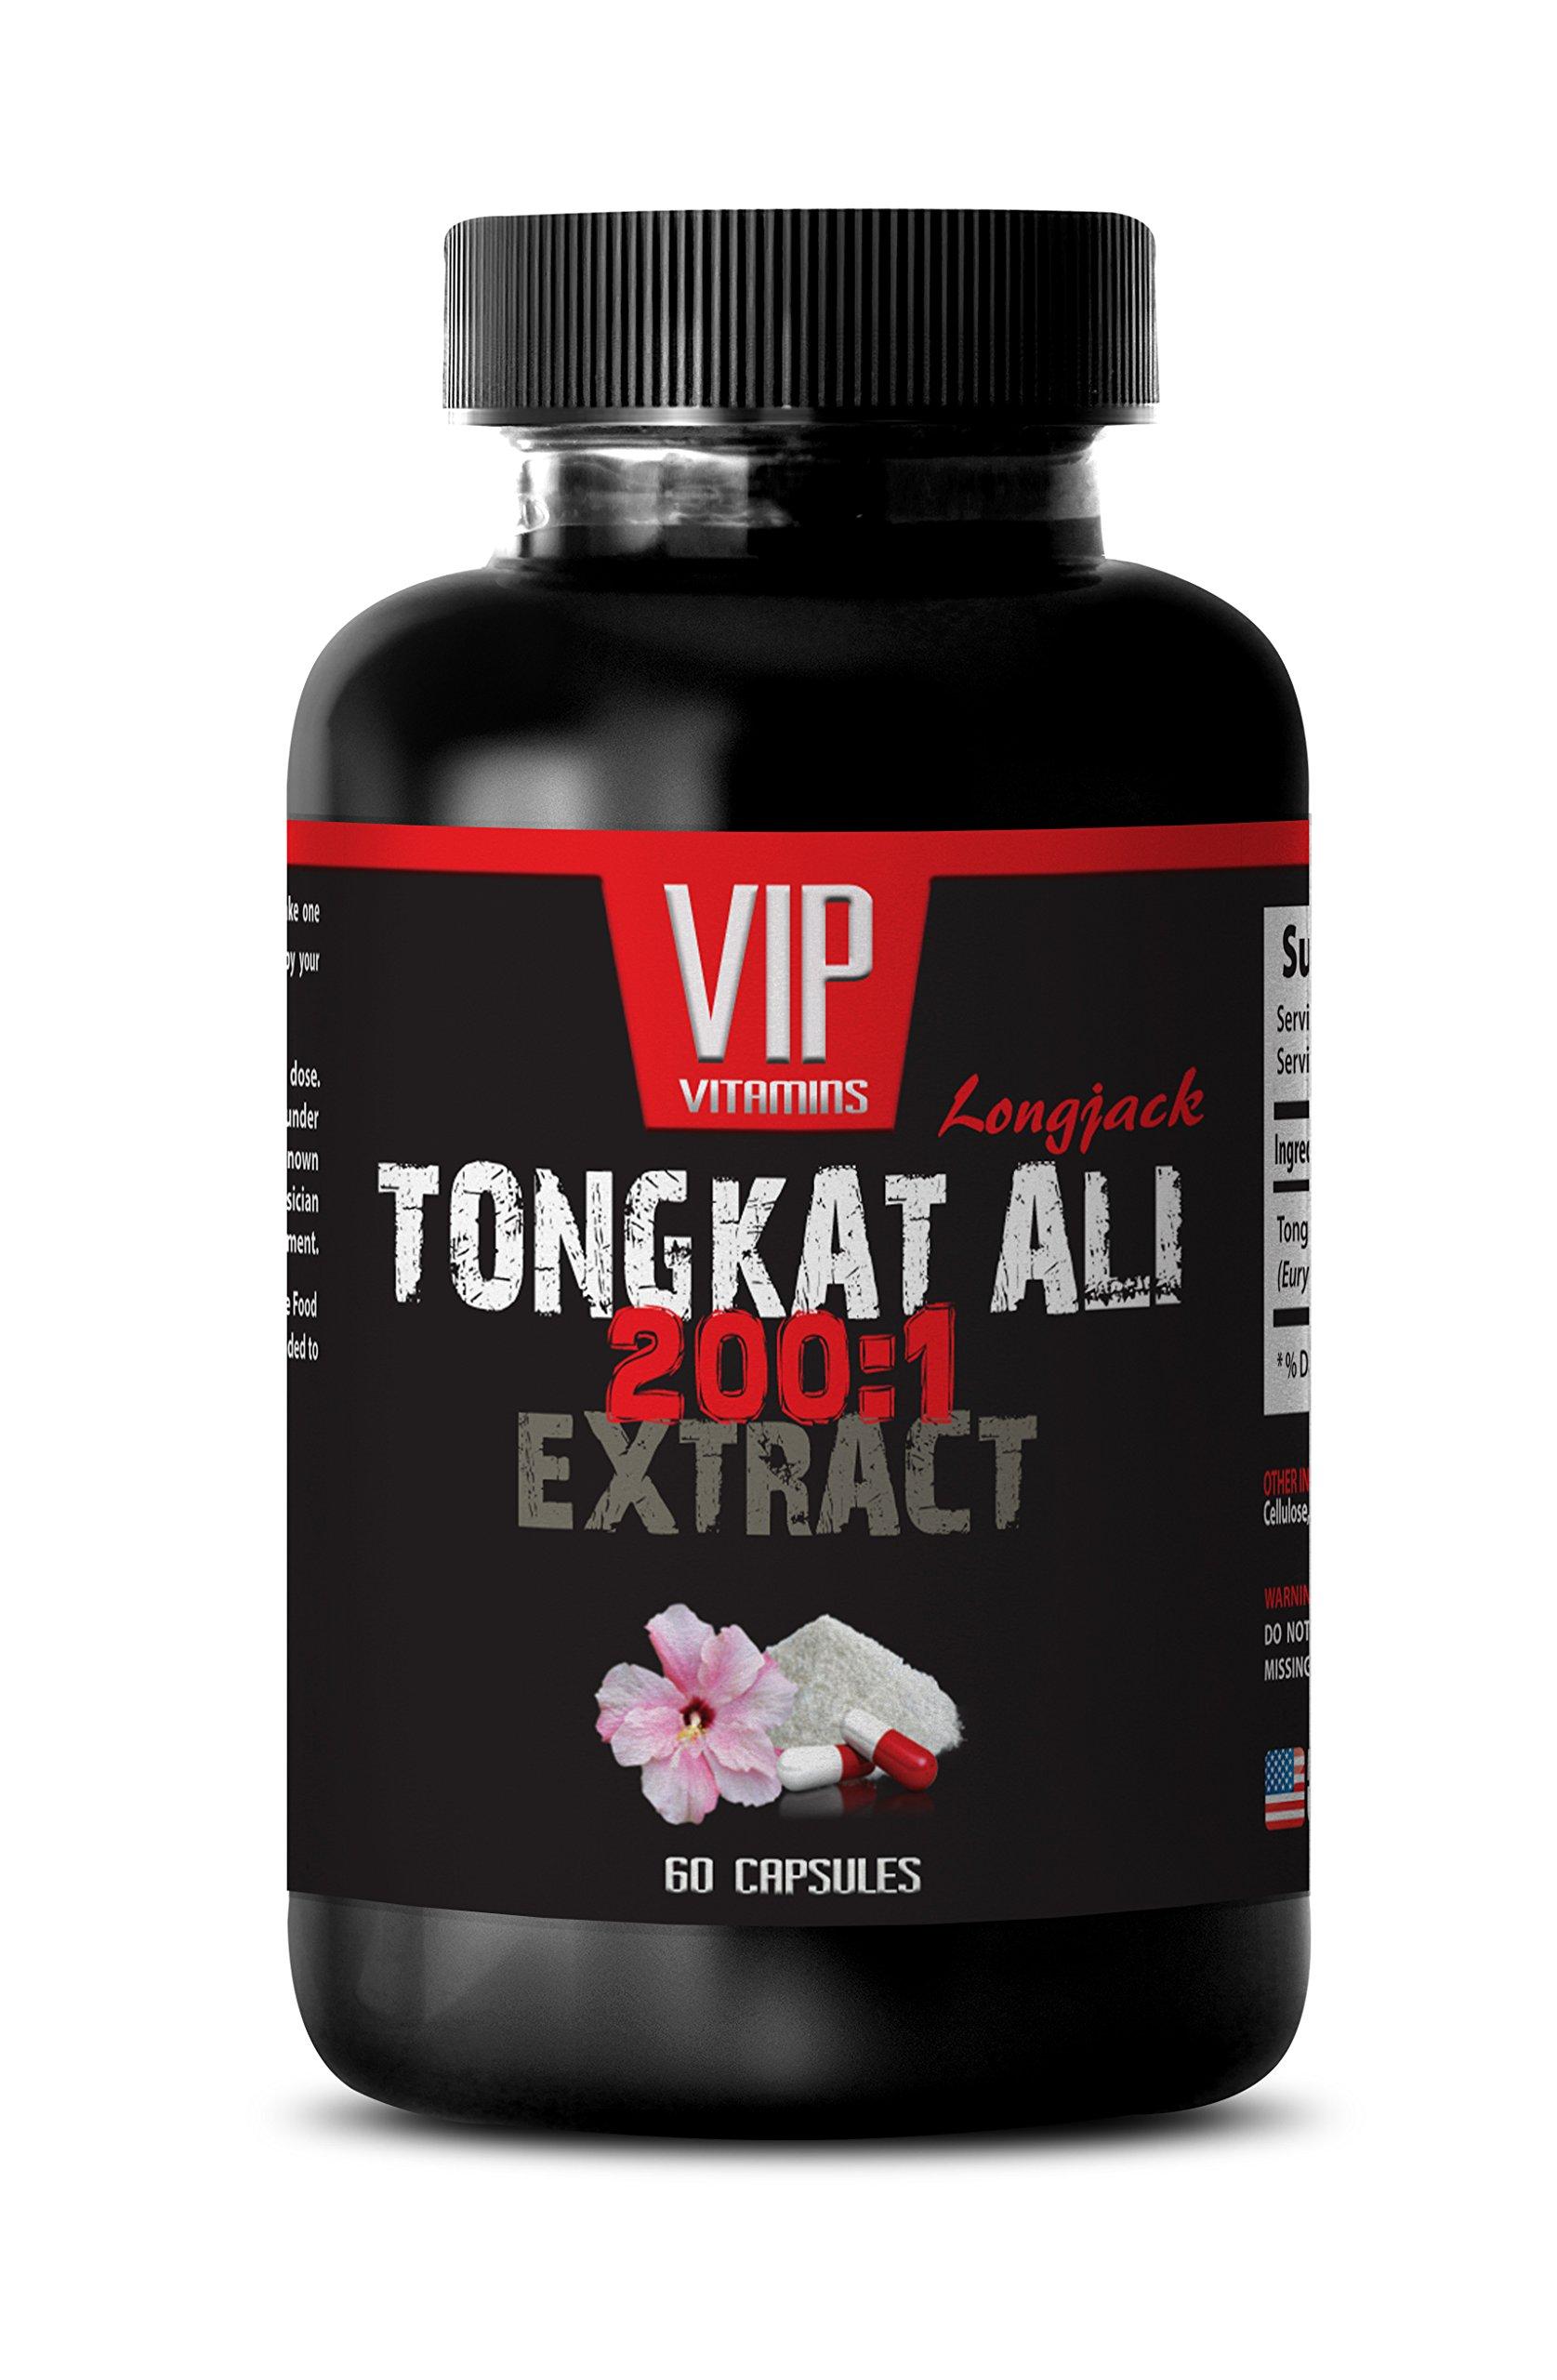 Natural male performance pills - TONGKAT ALI EXTRACT 200 TO 1 - Tongkat ali root extract - Tongkat ali supplement - 1 Bottle 60 Capsules